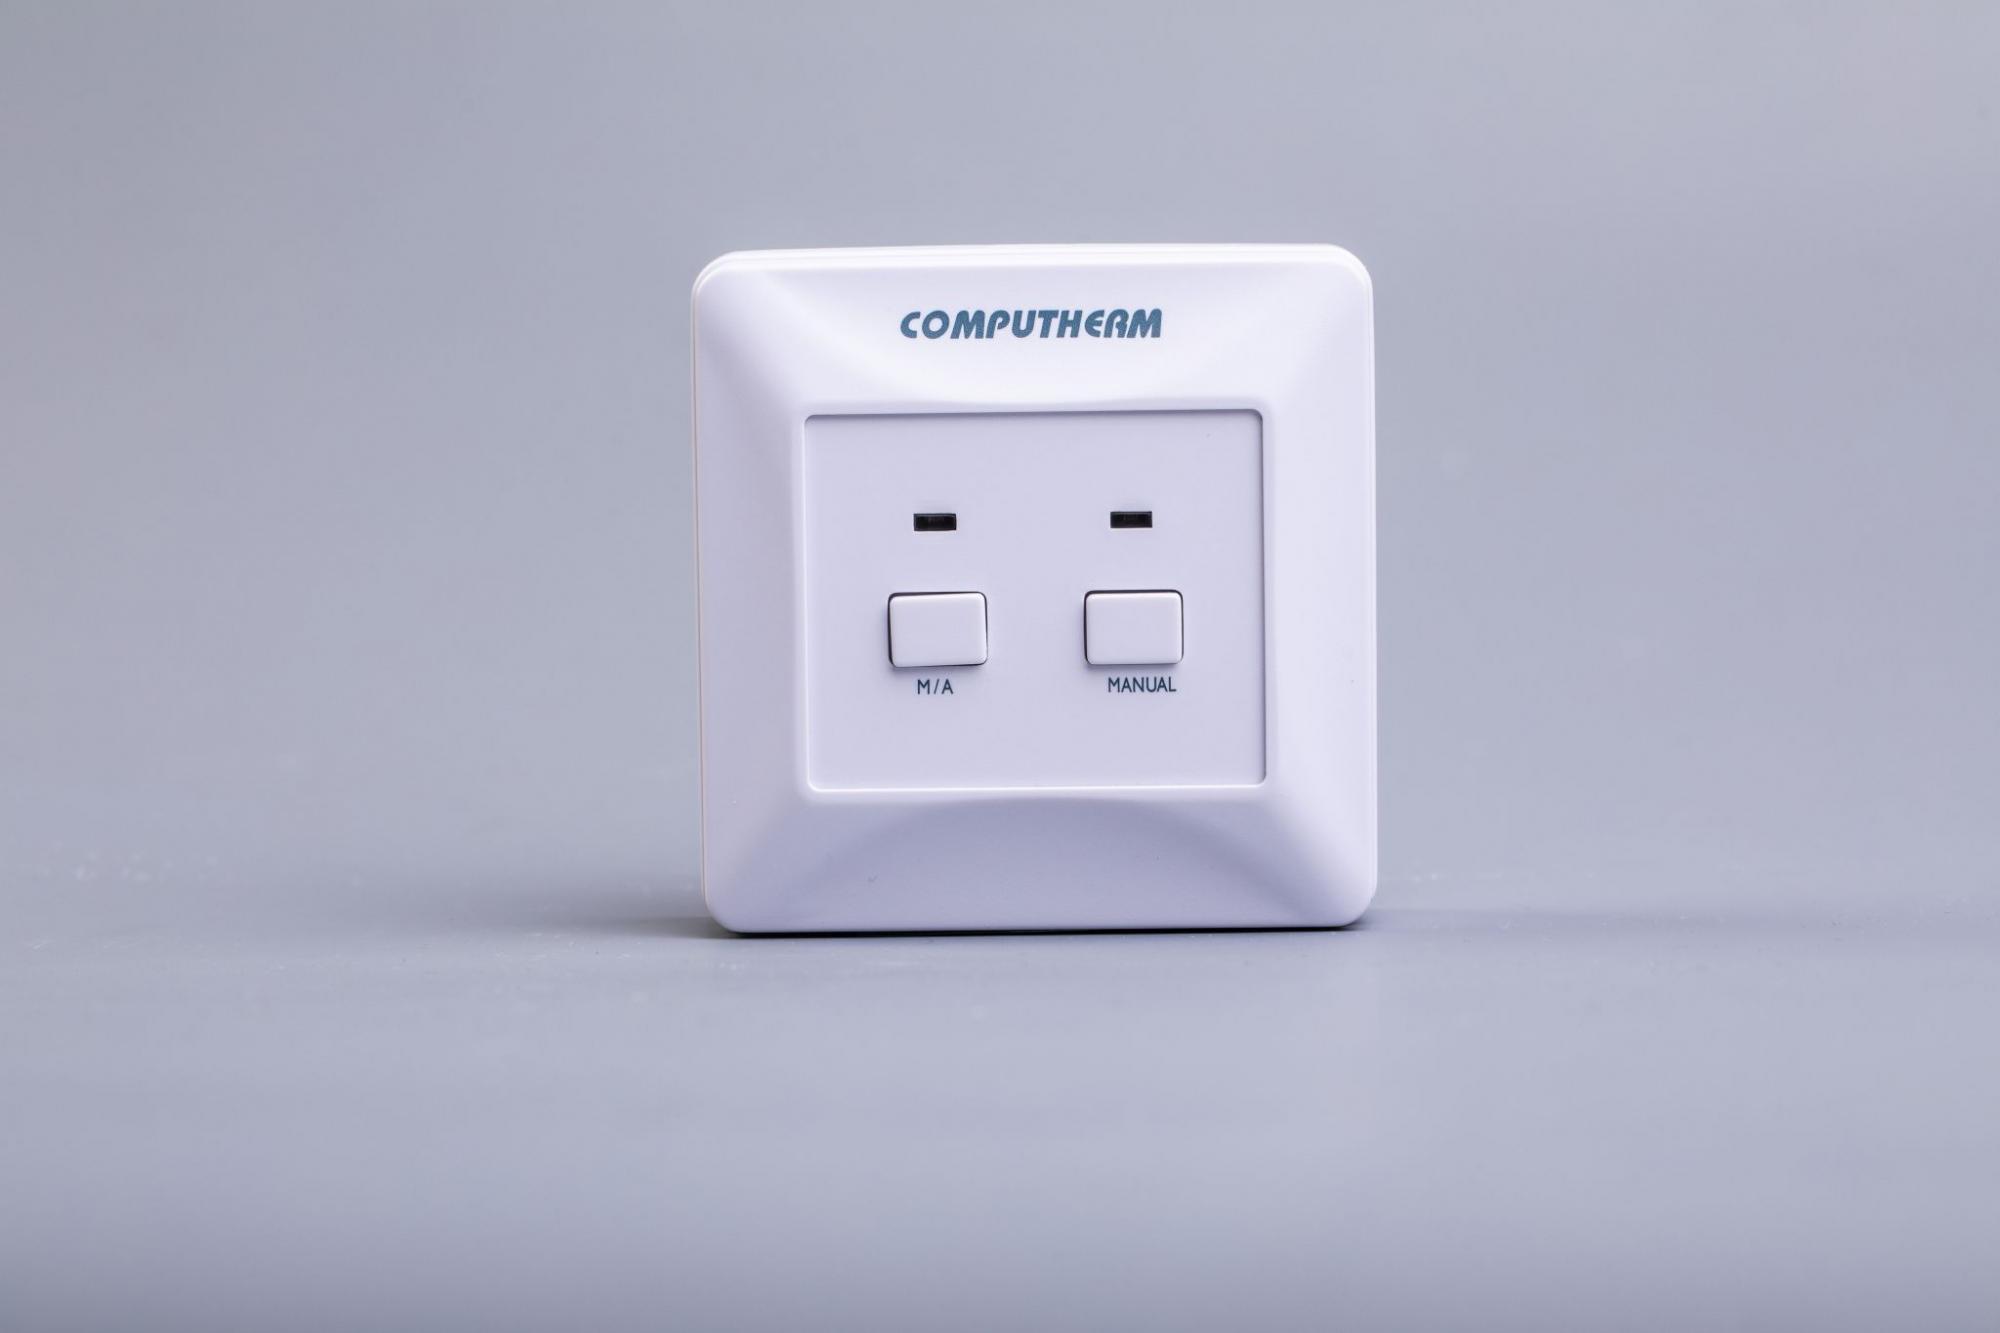 Computherm - Digitális termosztátok - COMPUTHERM Q7RF - Quantrax Kft.